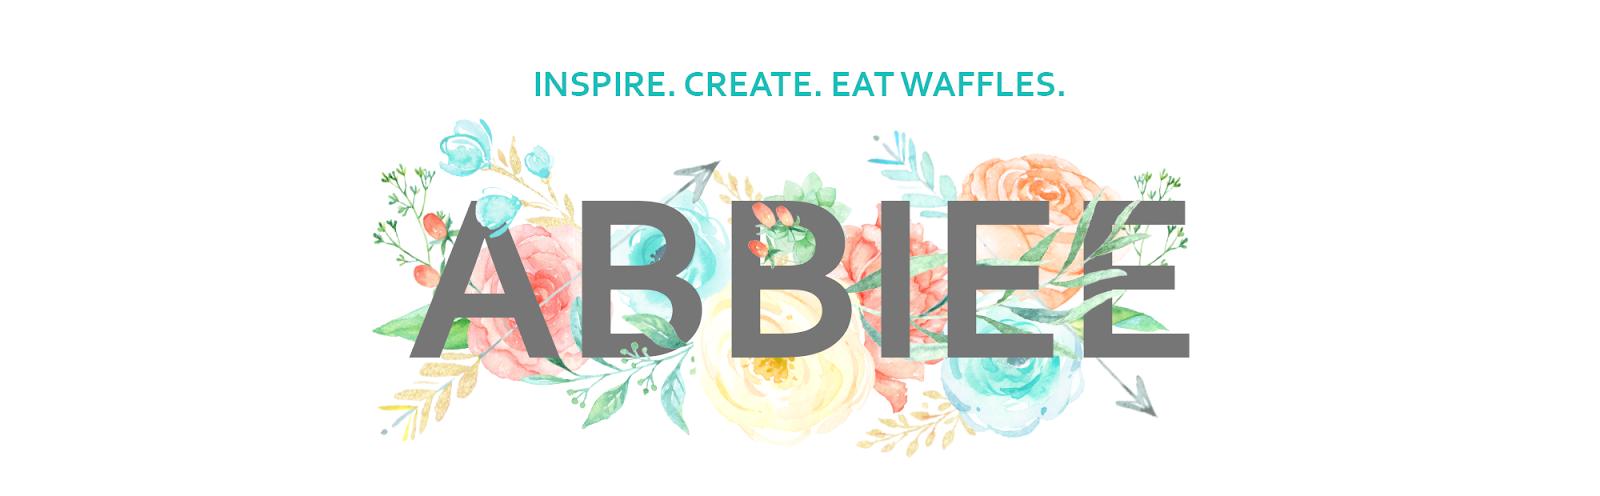 Abbiee - Inspire. Create. Eat Waffles.